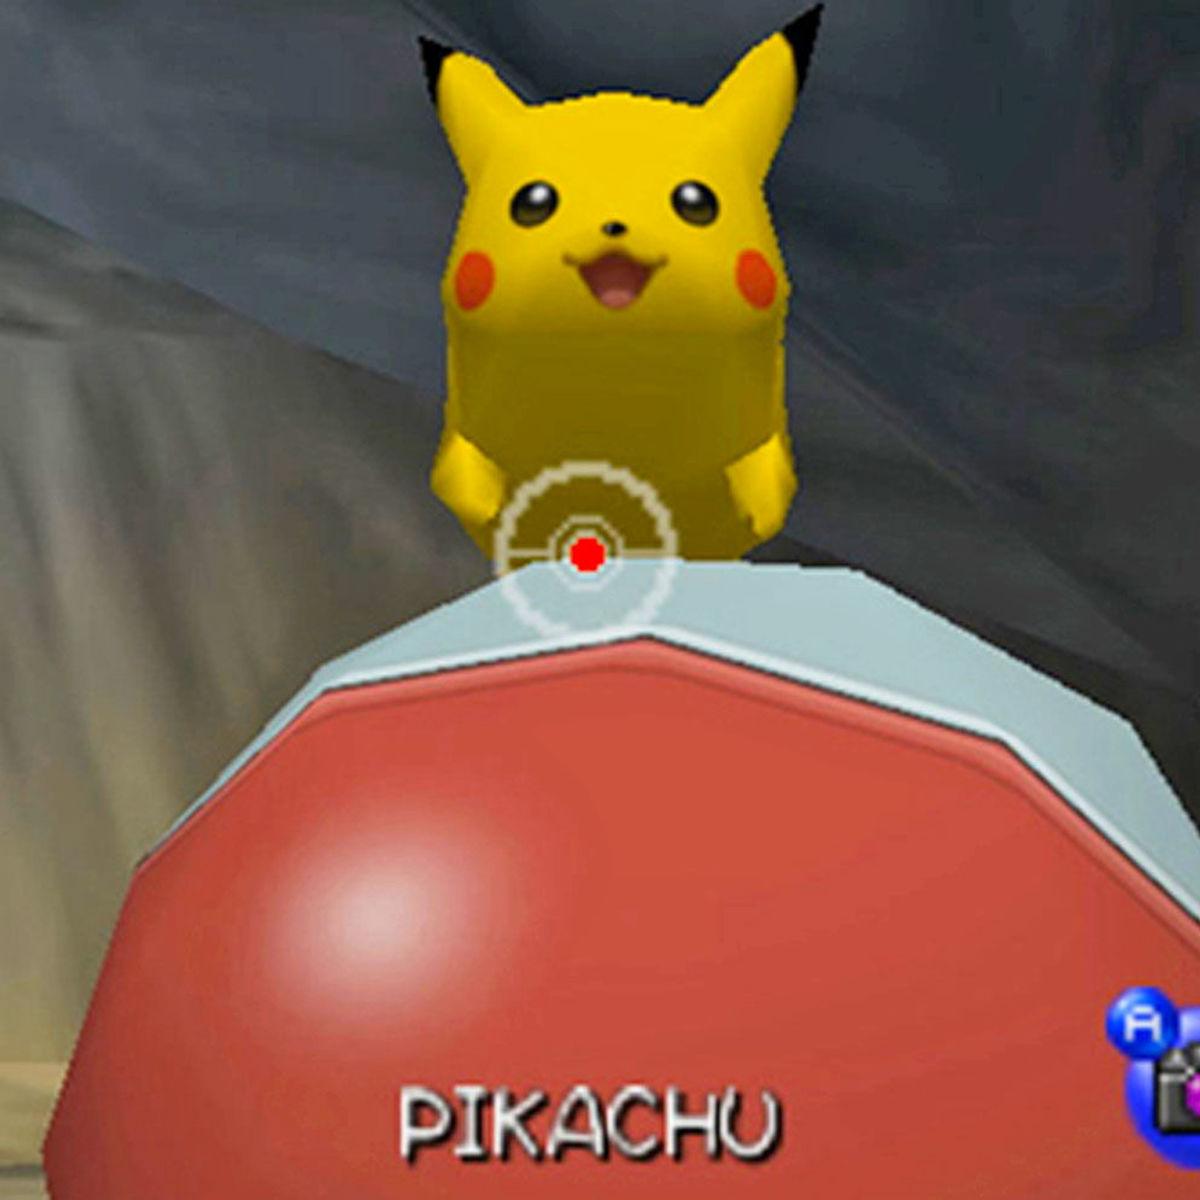 Pikachu pokemon snap